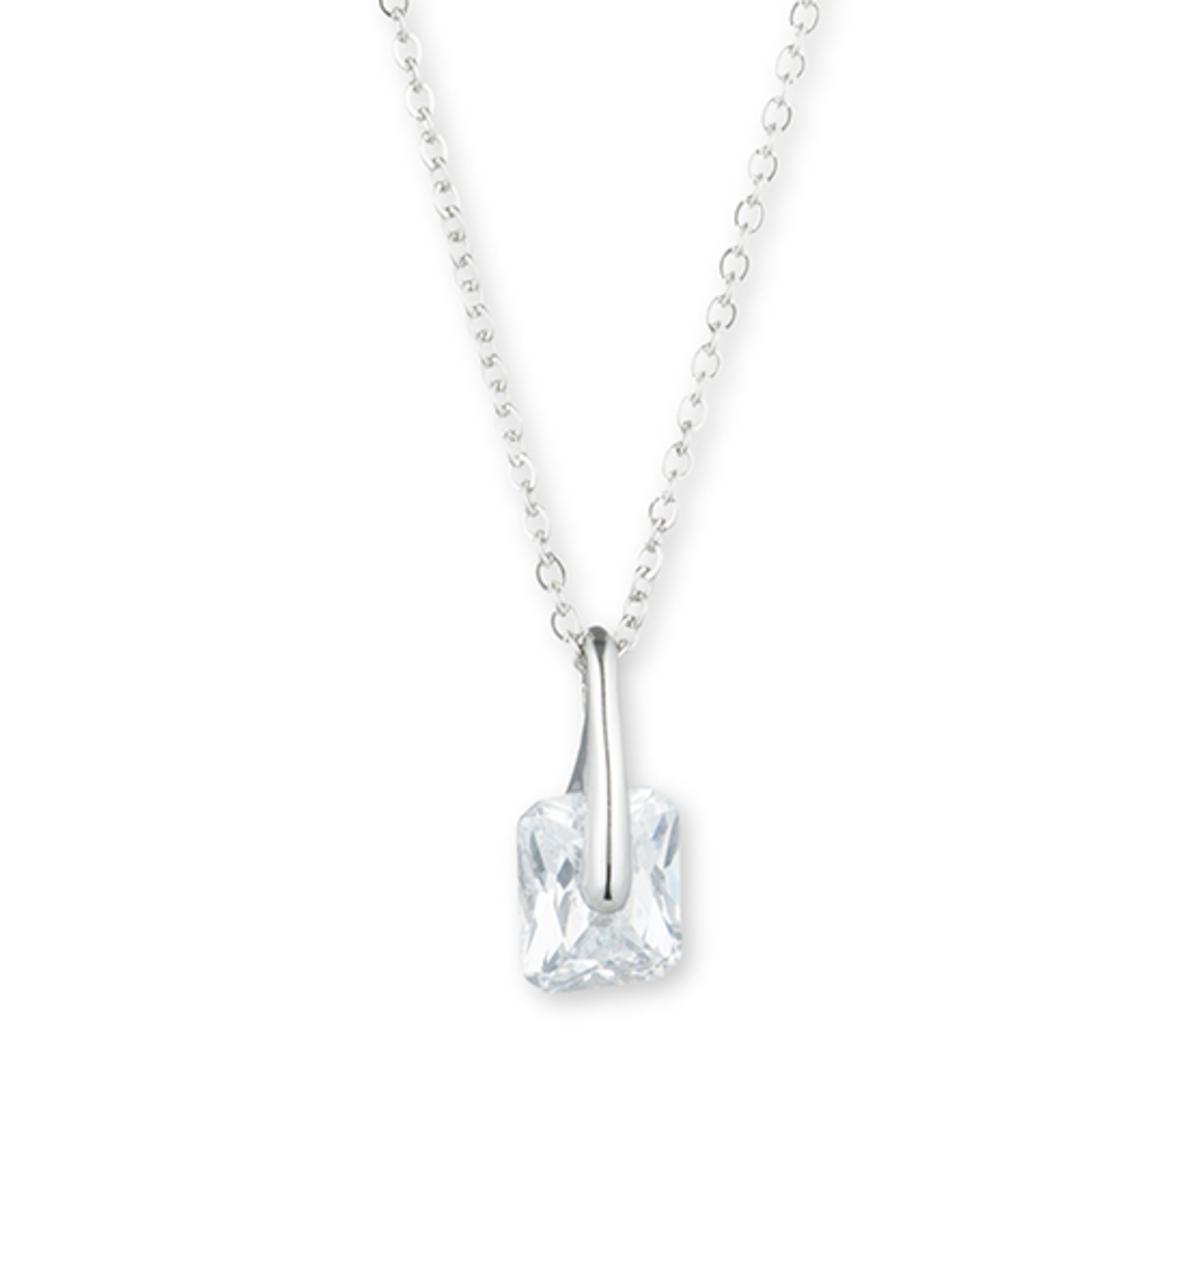 Stone pendant necklace   silver